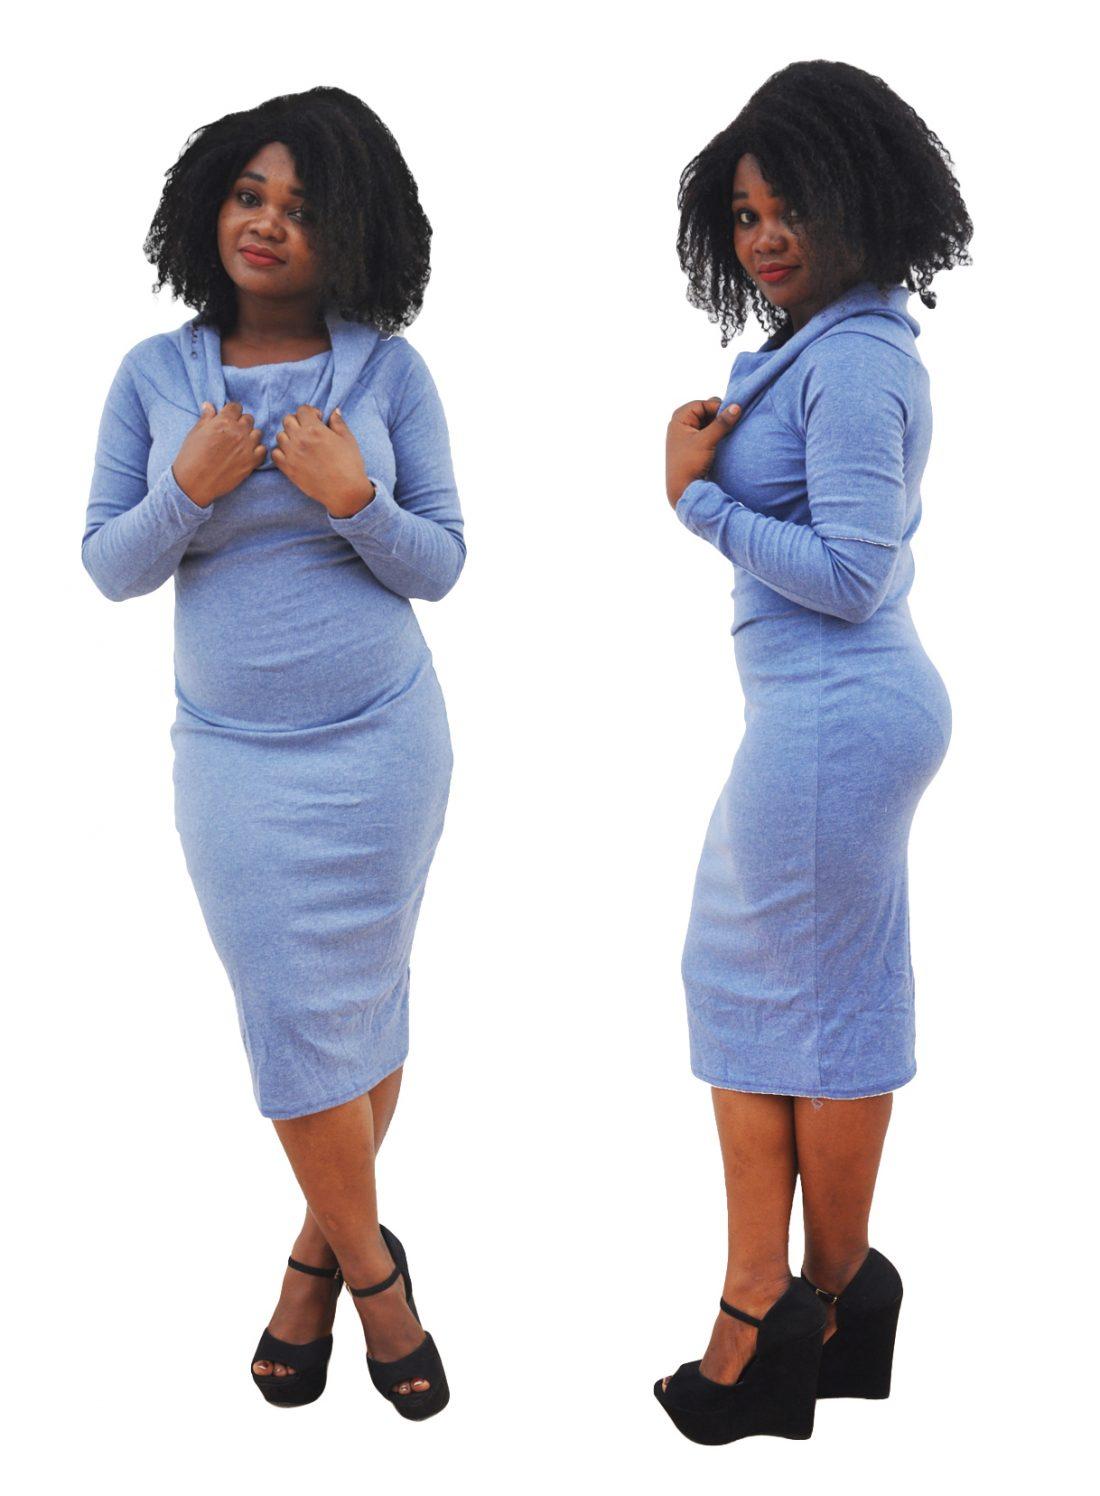 M0268 blue1 Long Sleeve Dresses maureens.com boutique